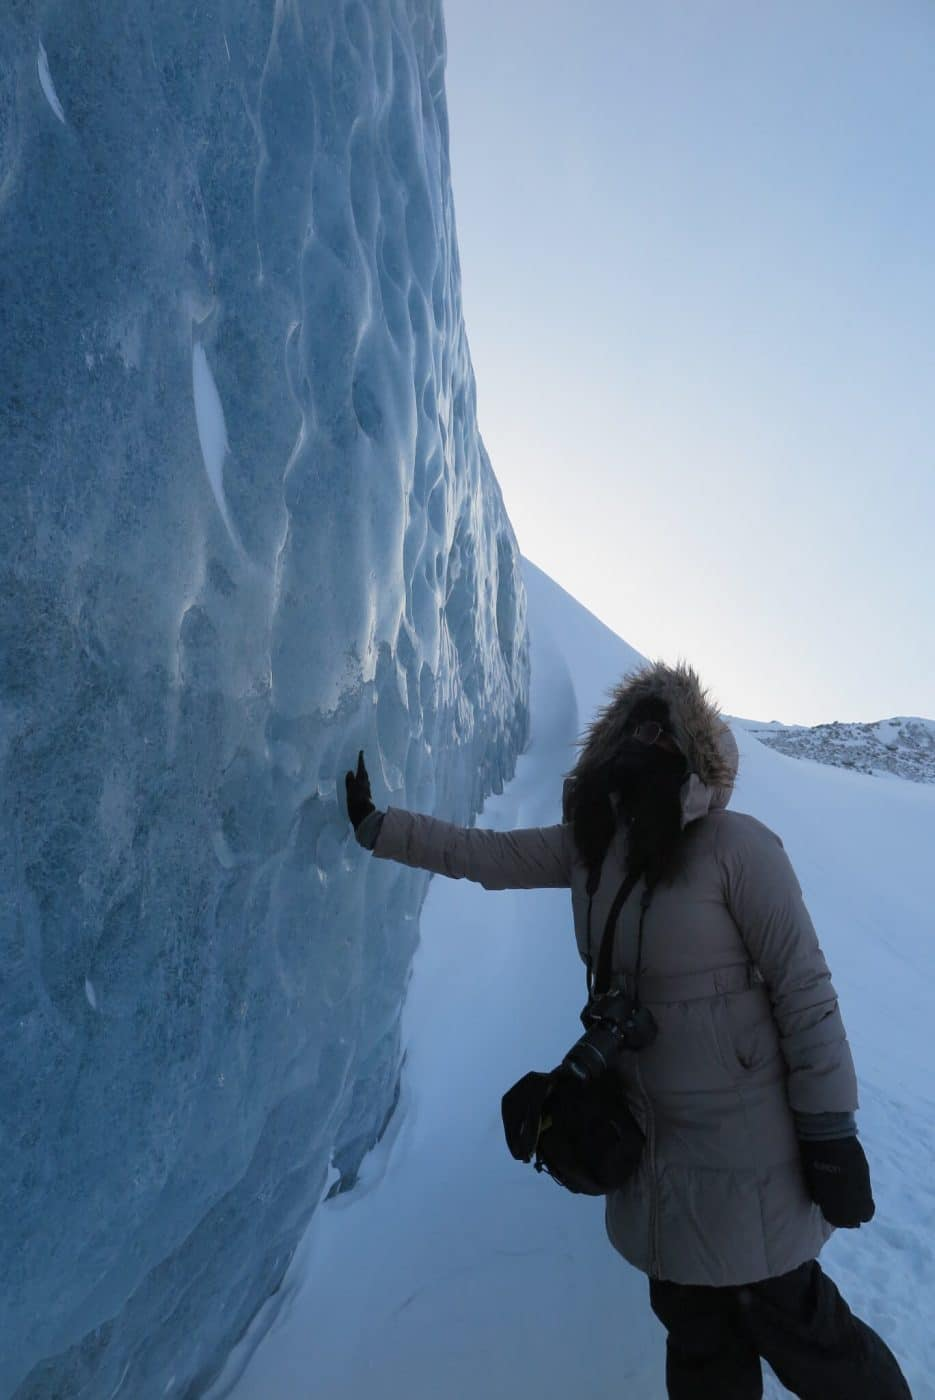 Greenland Ice Sheet. Ilulissat. Photo by Vibha Dania-Dhawan